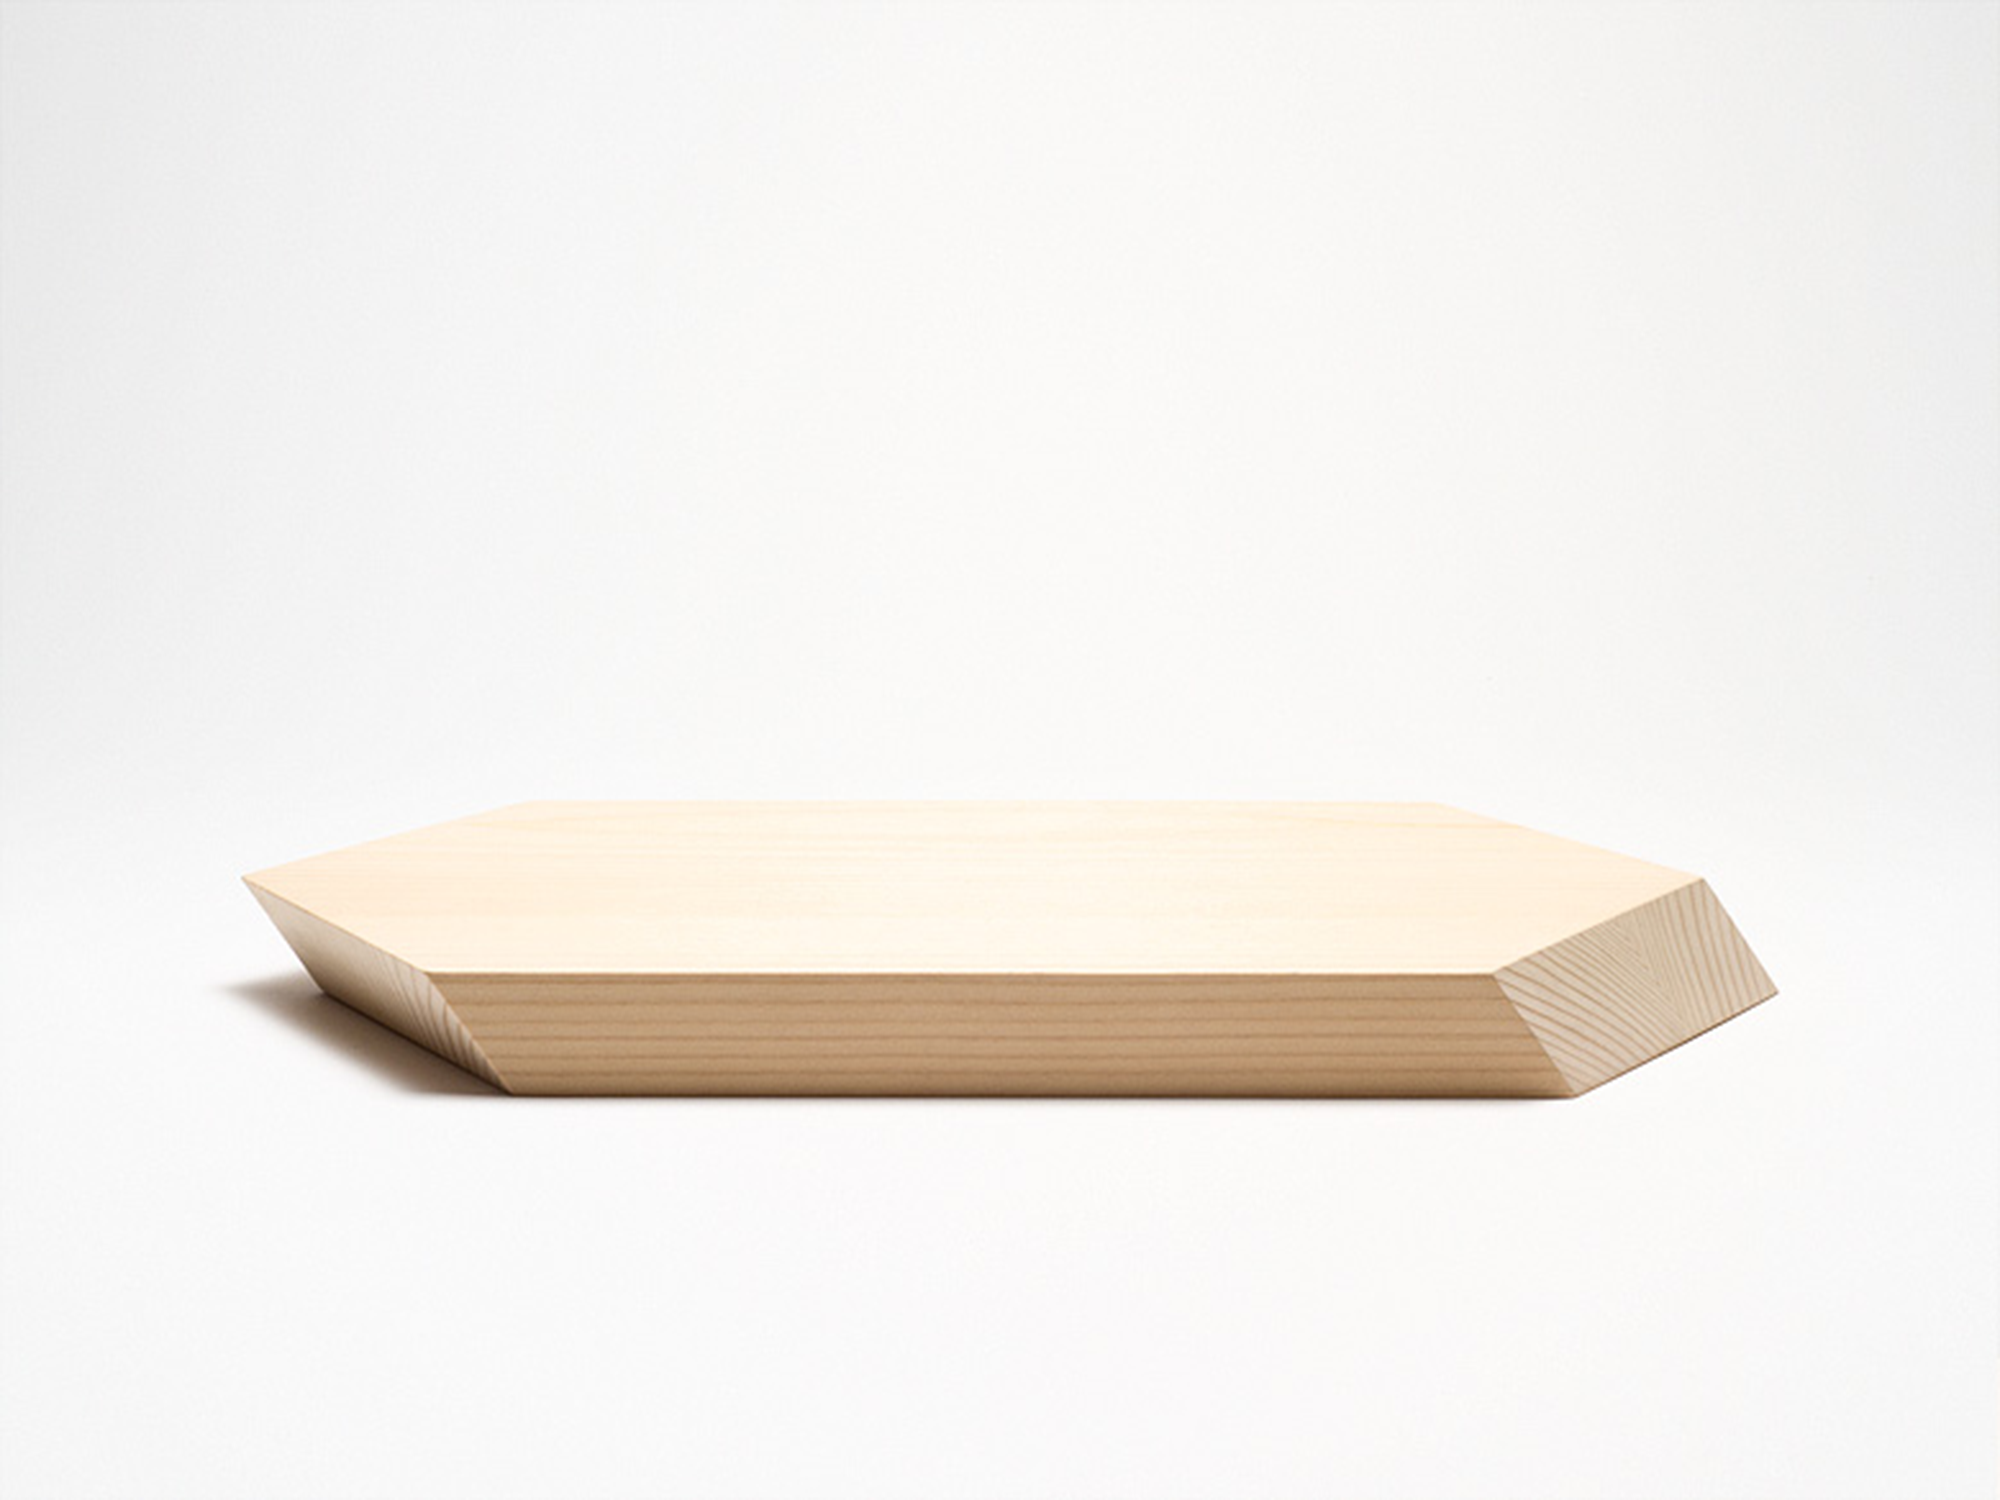 Designapplause Hex Cutting Board Jonah Takagi